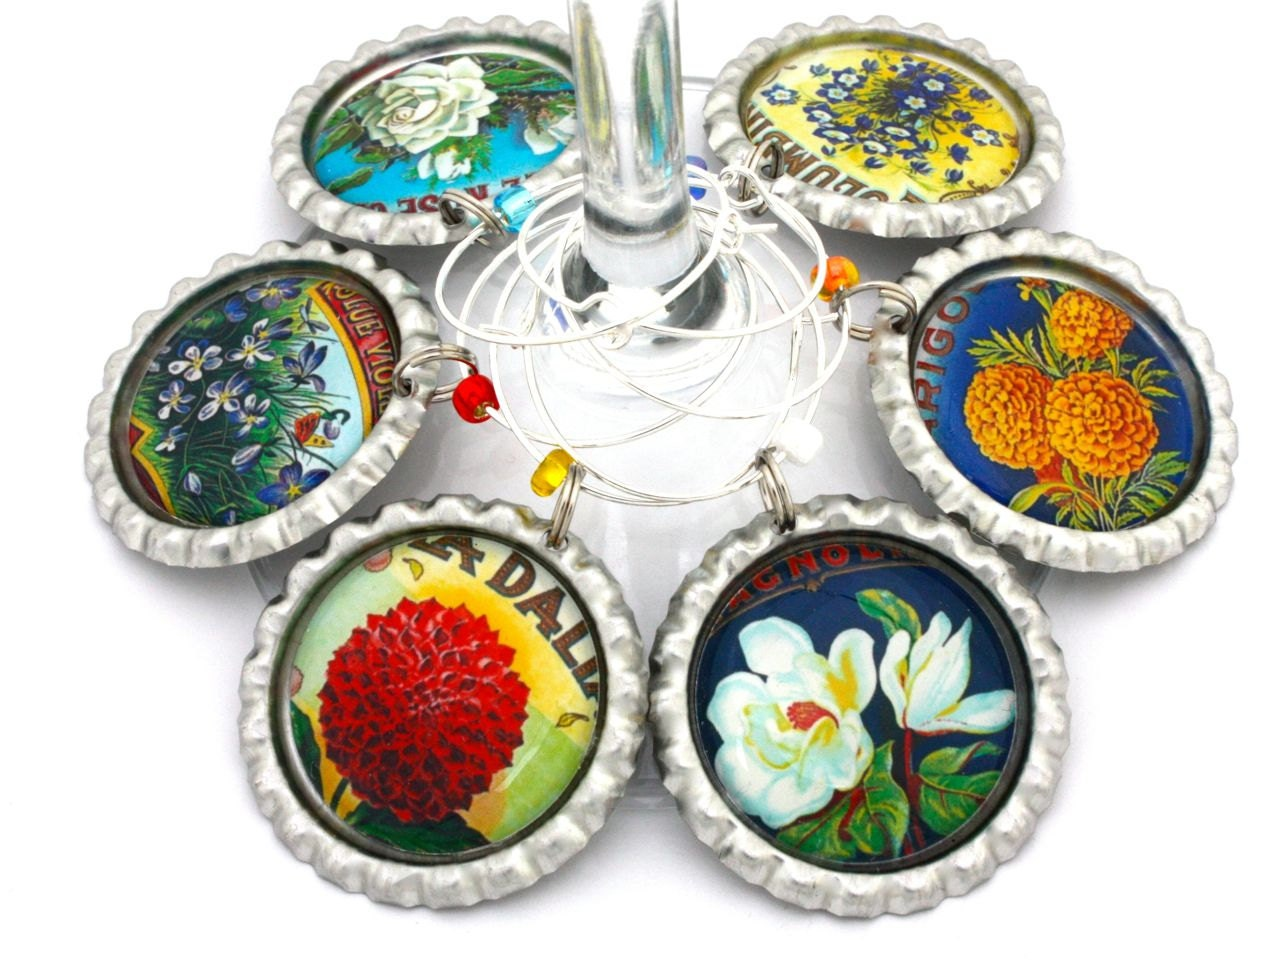 Flowers For Bridal Shower Favors : Flower bridal shower favors vintage seed packet wine charms